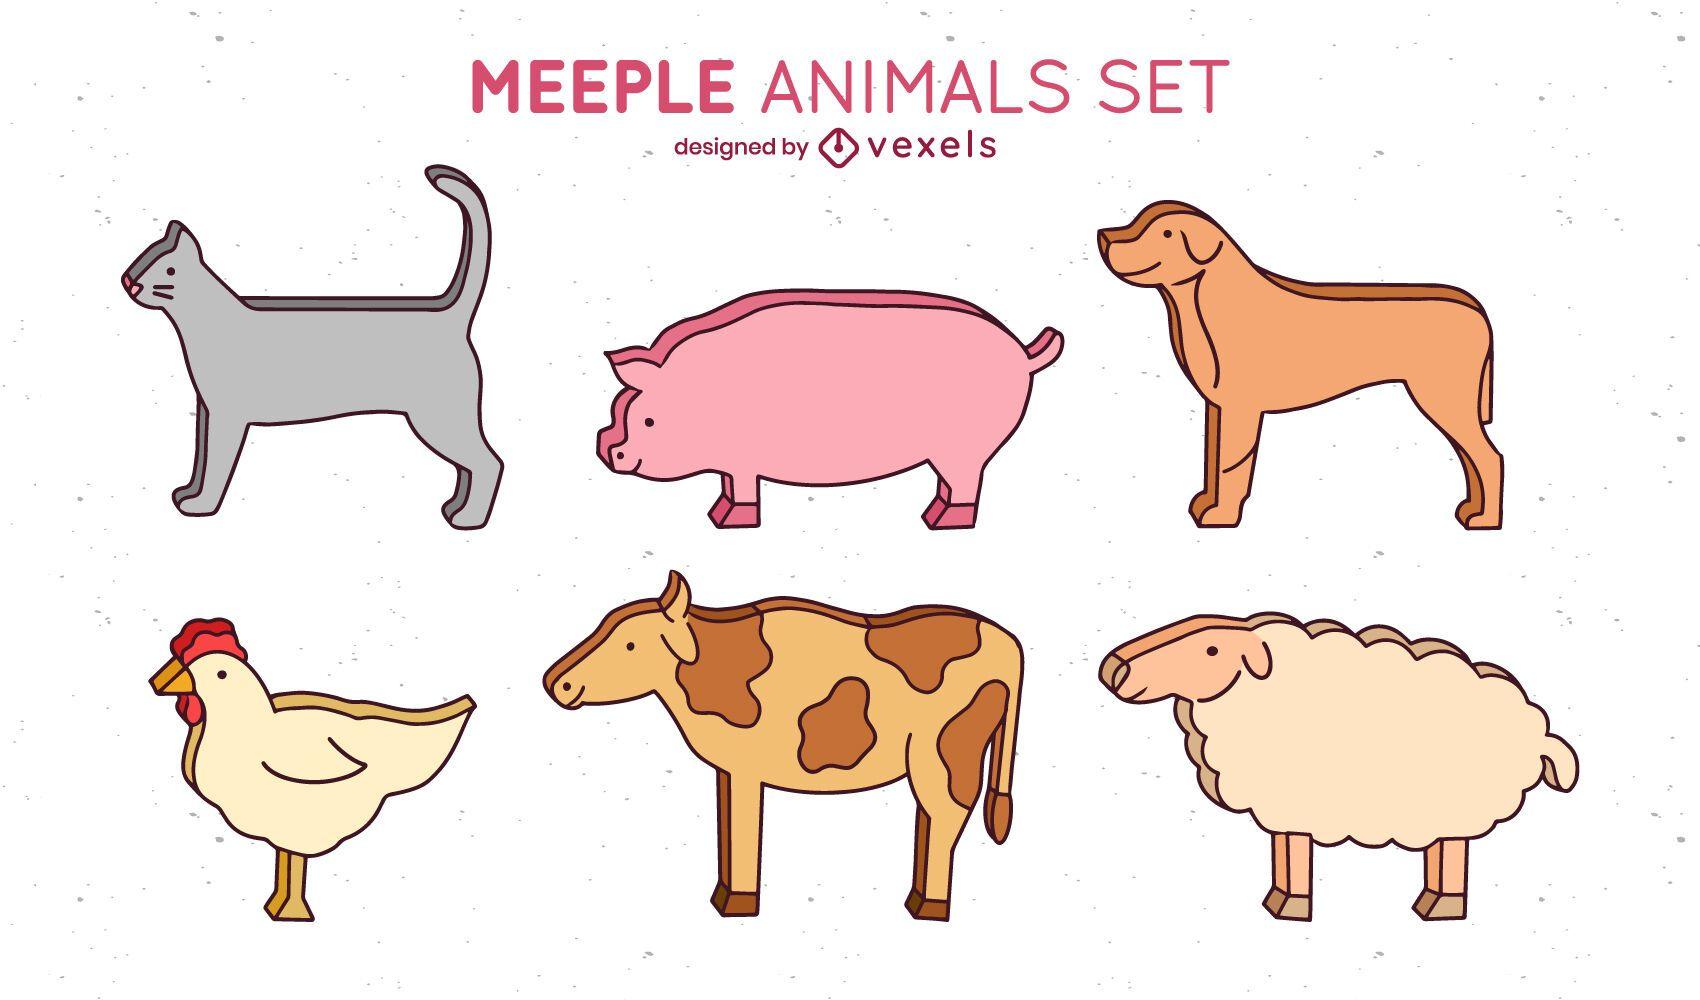 Meeple animals set design